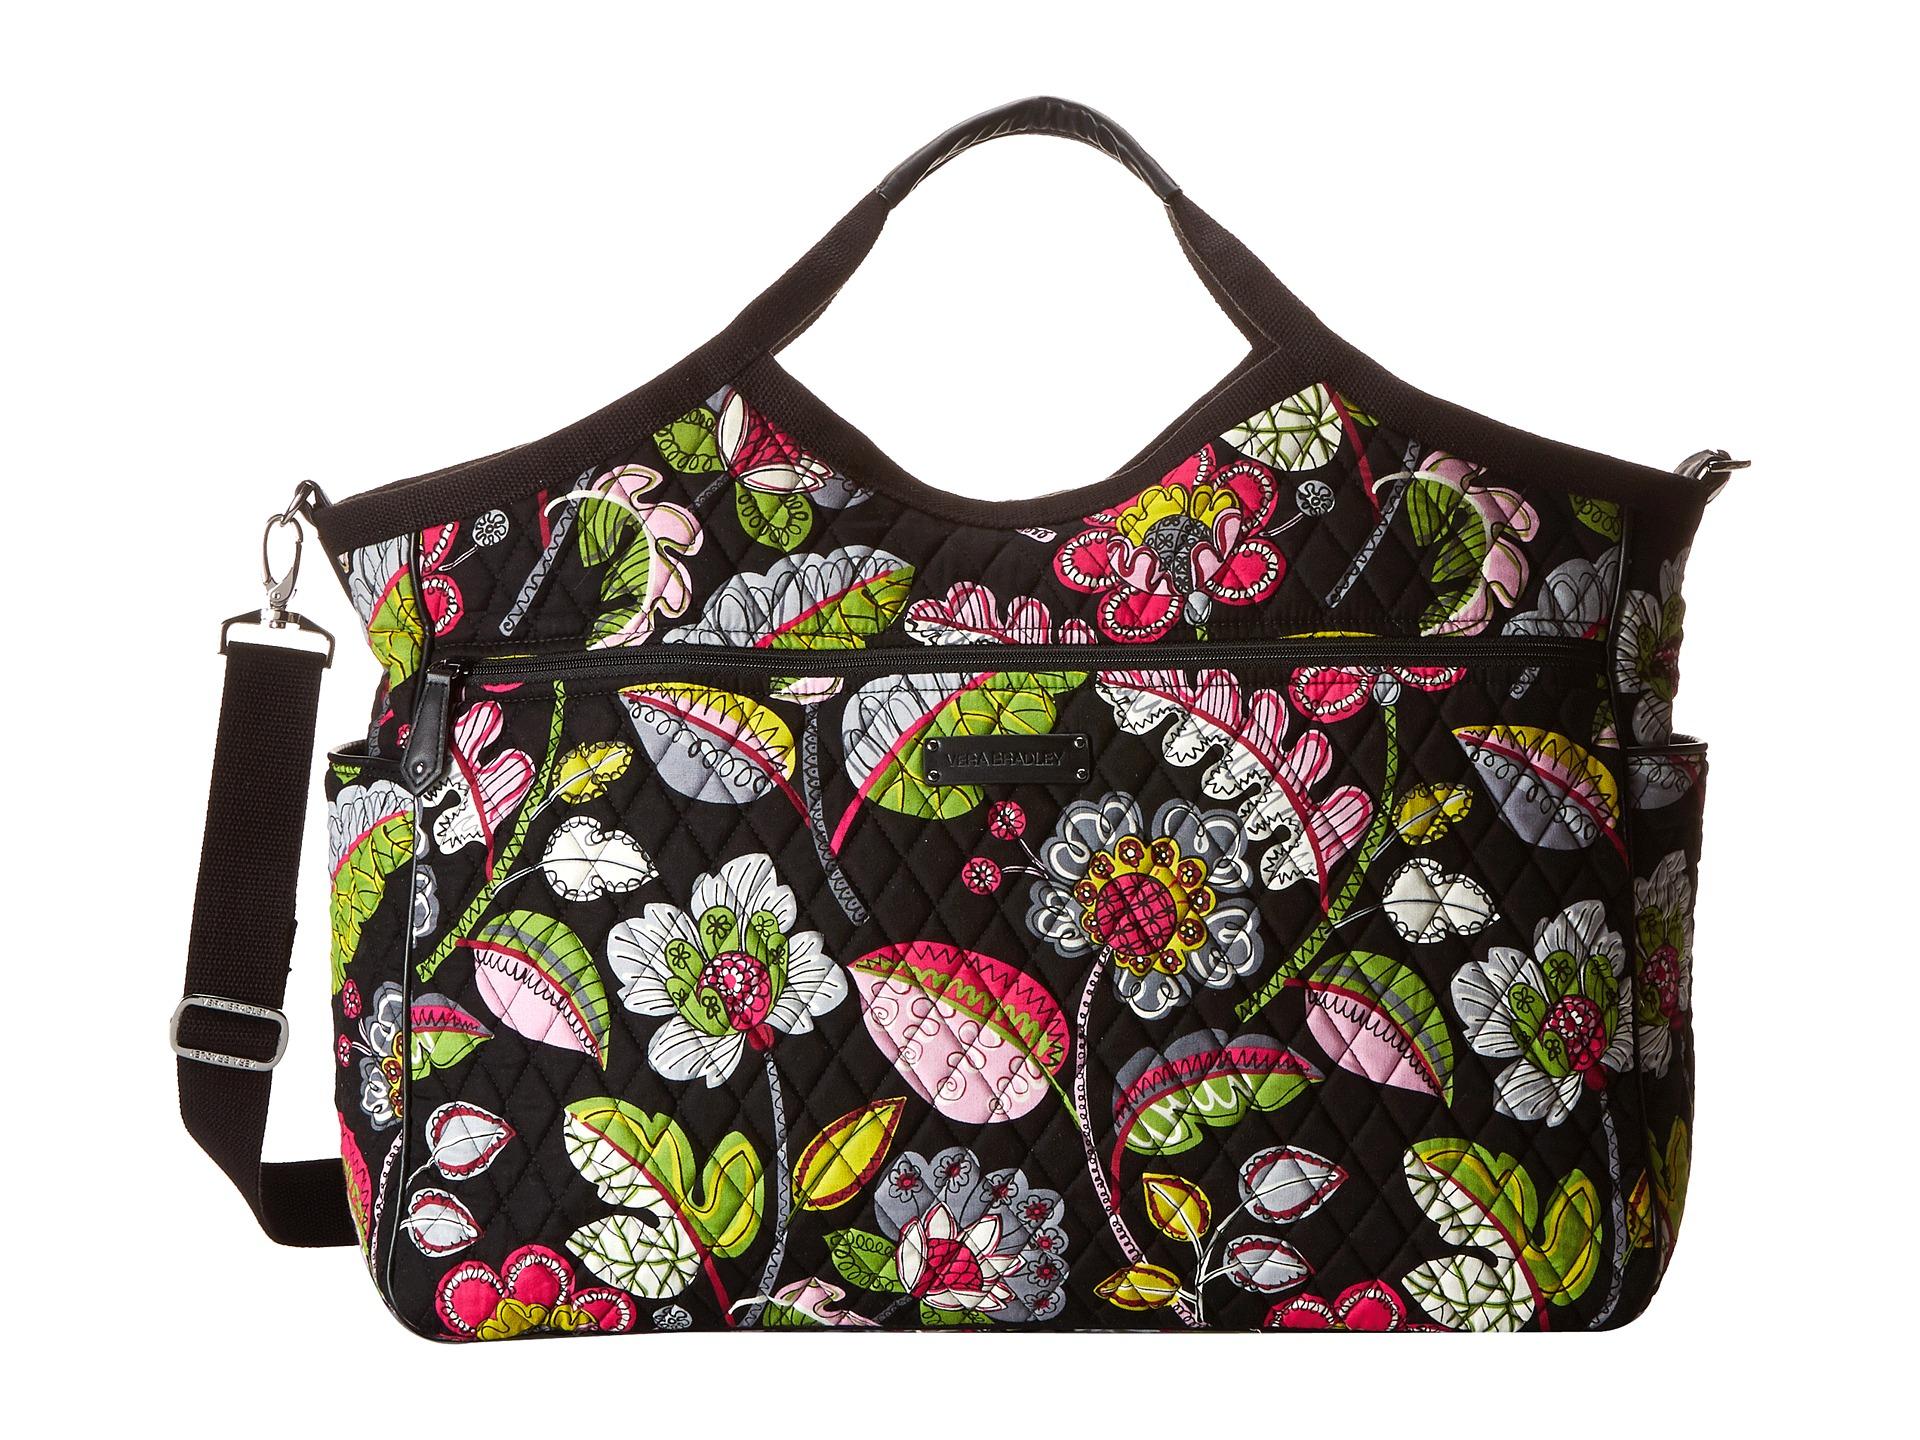 Vera Bradley Carryall Travel Bag In Classic Black  c56cd7c8bbd0a